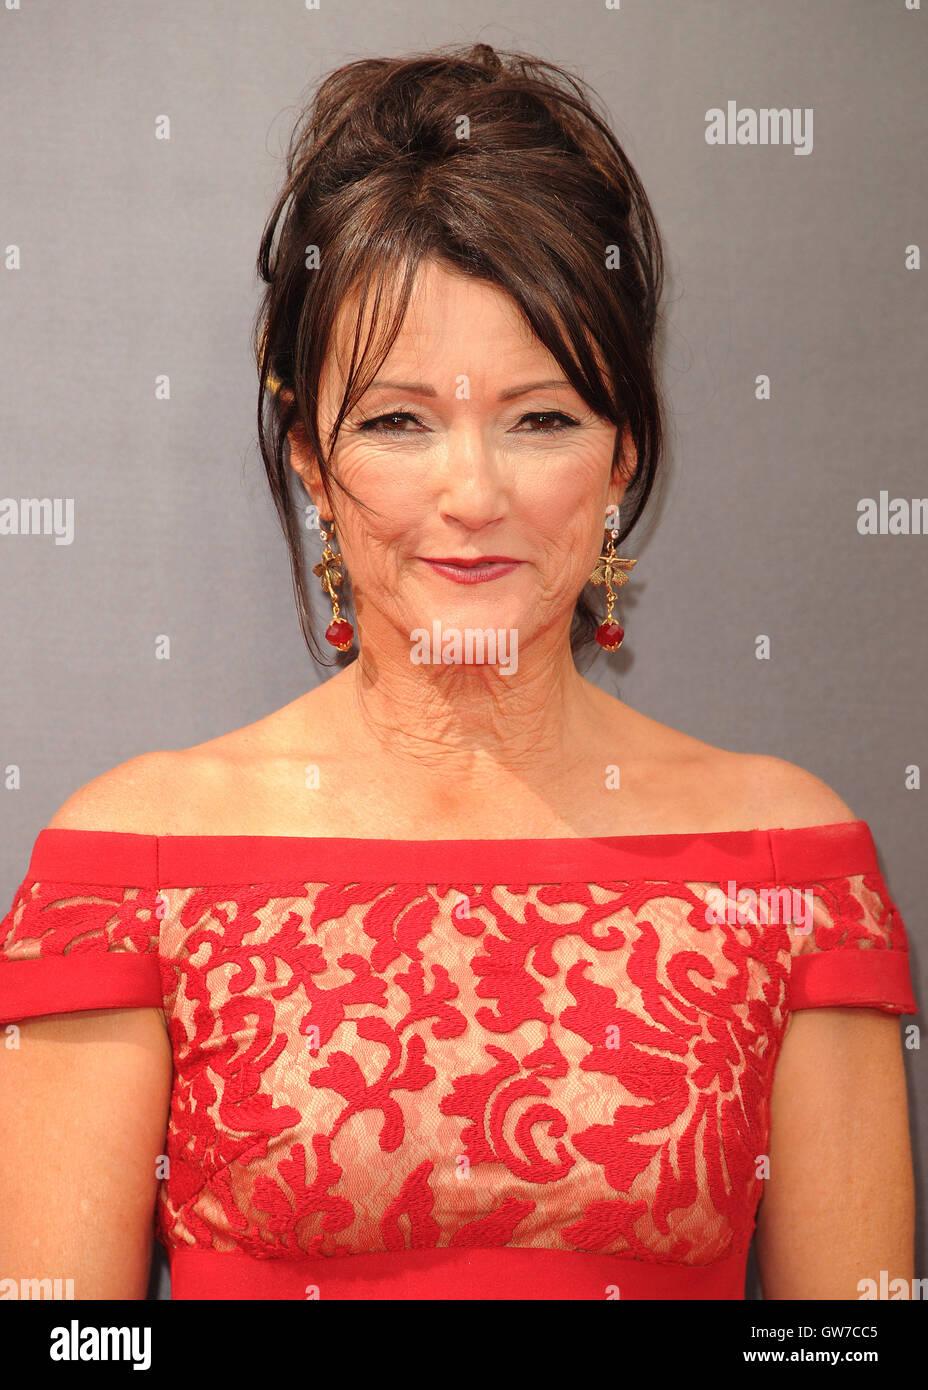 Freda Jackson,Victoria Jackson XXX pic Jacklyn Zeman born March 6, 1953 (age 65),Malavika